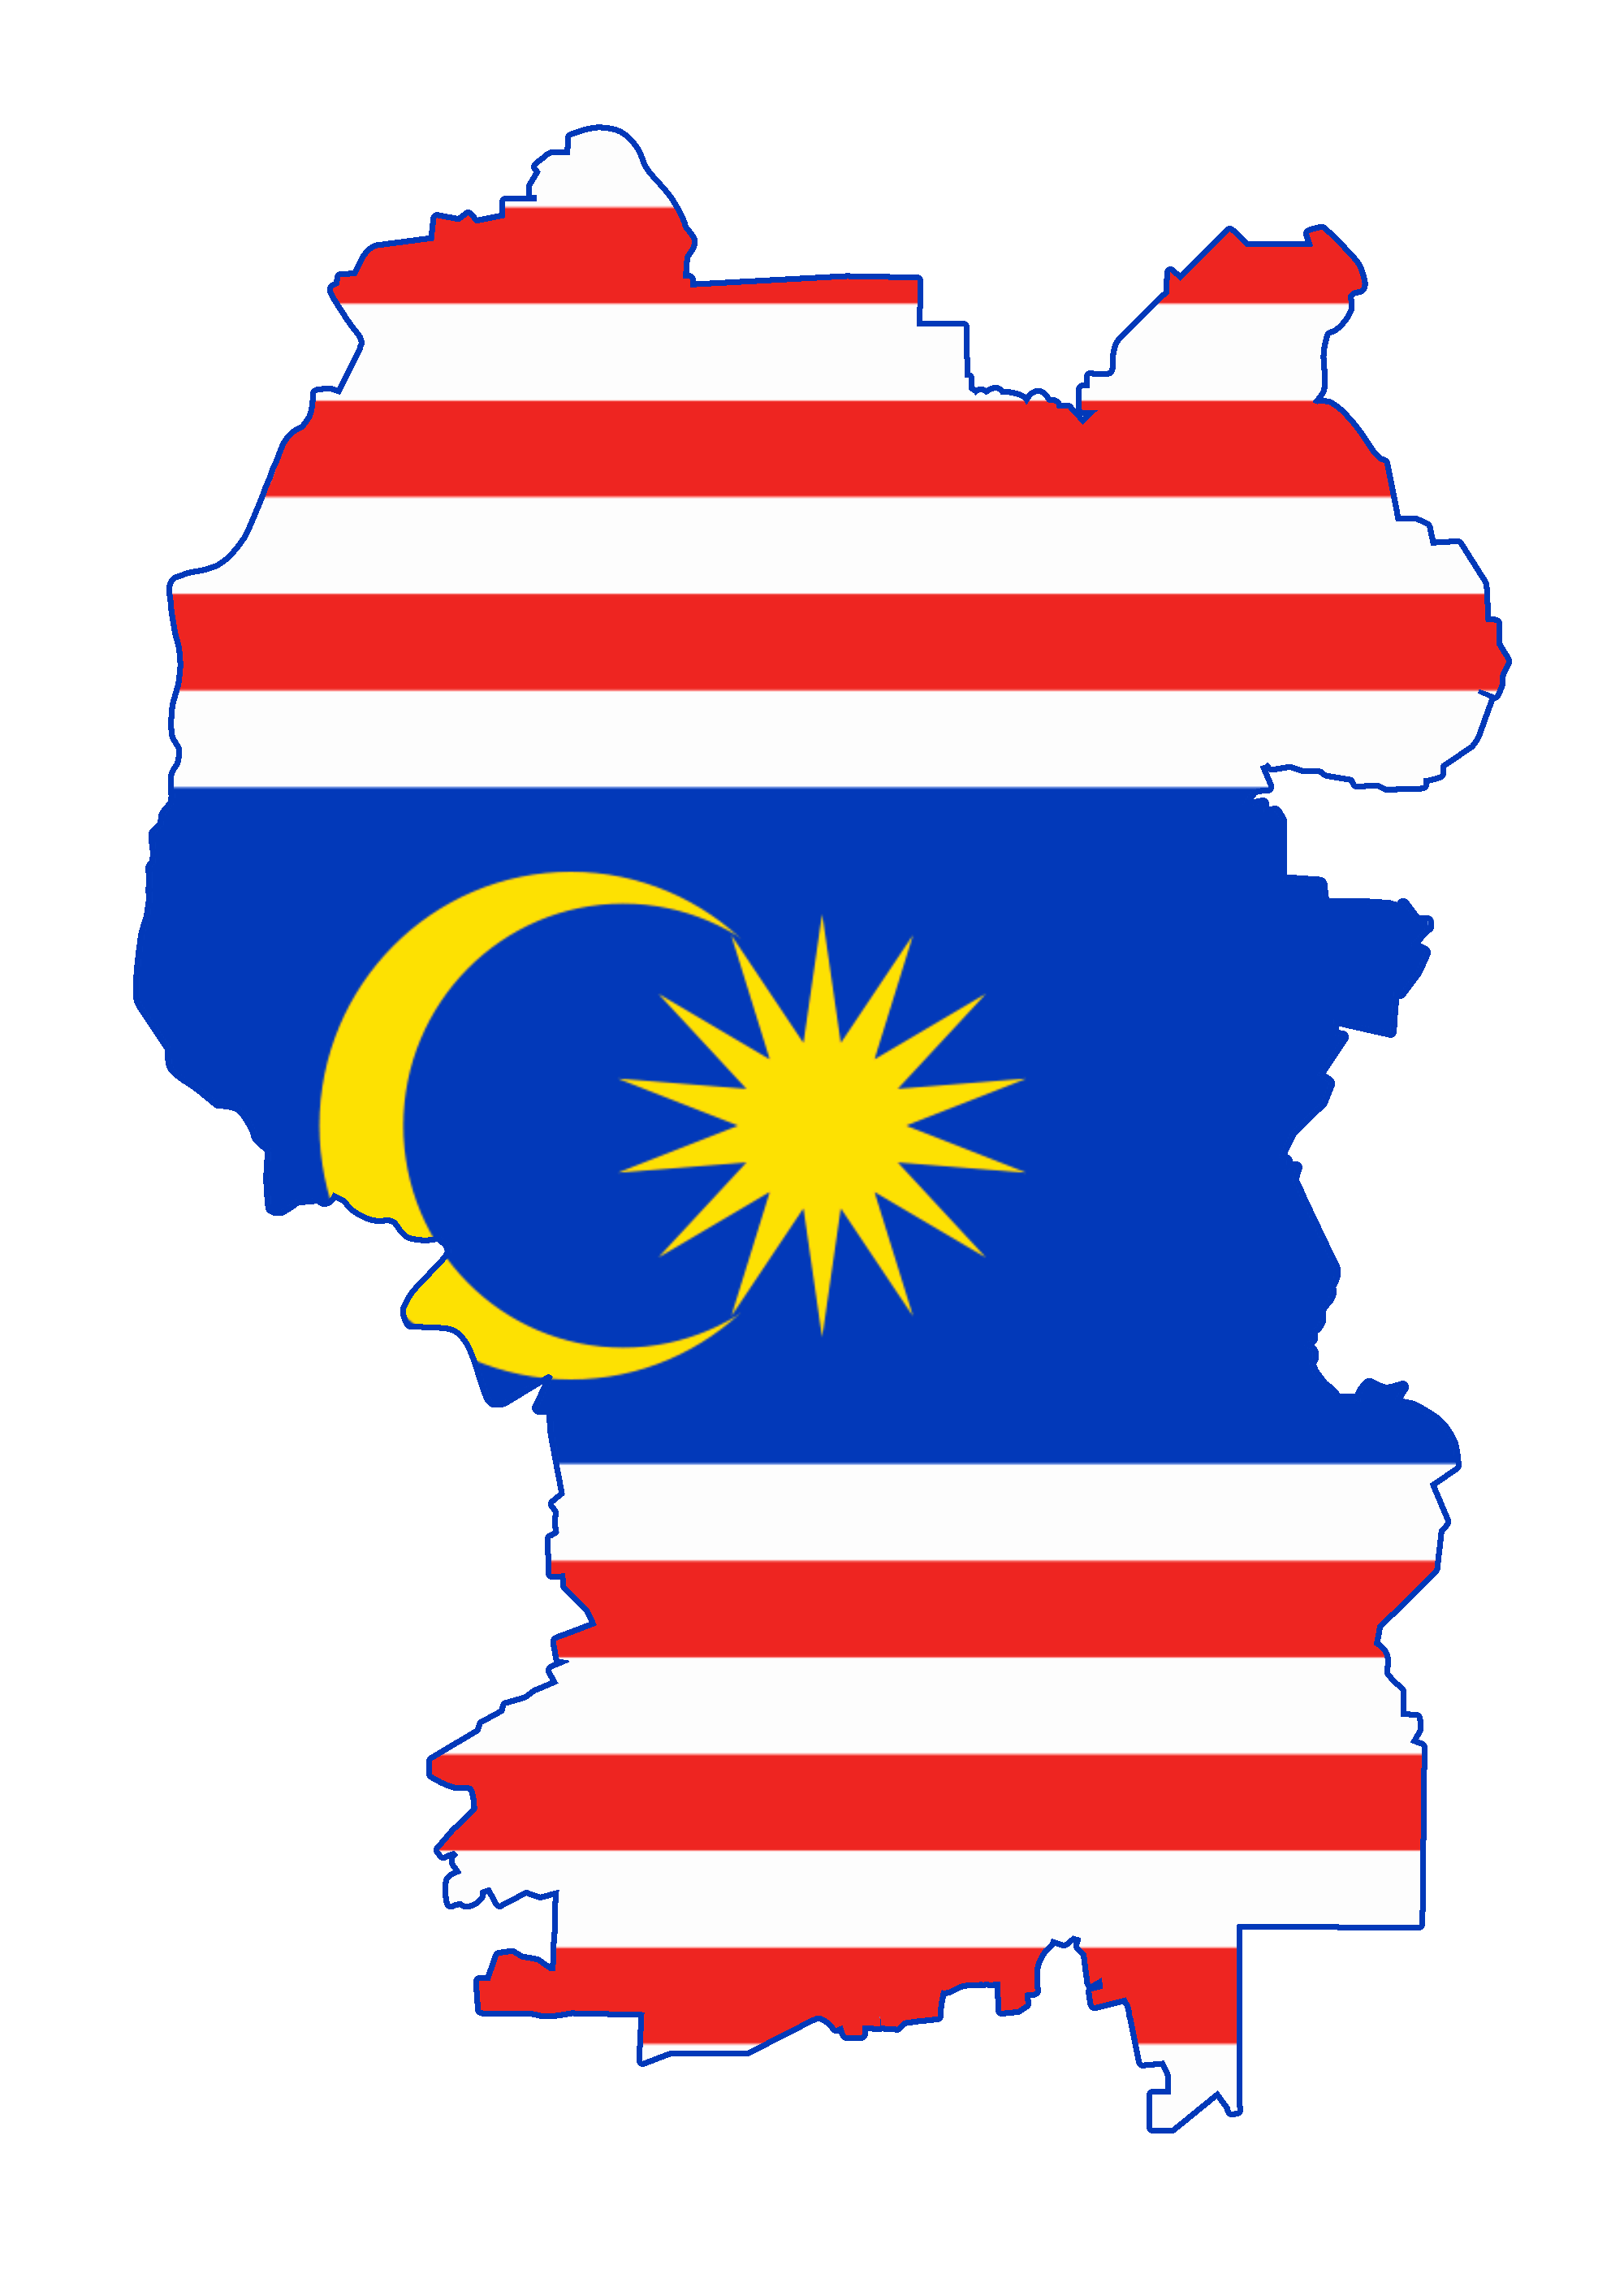 Malaysia flag transparent png. Sunglasses clipart patriotic